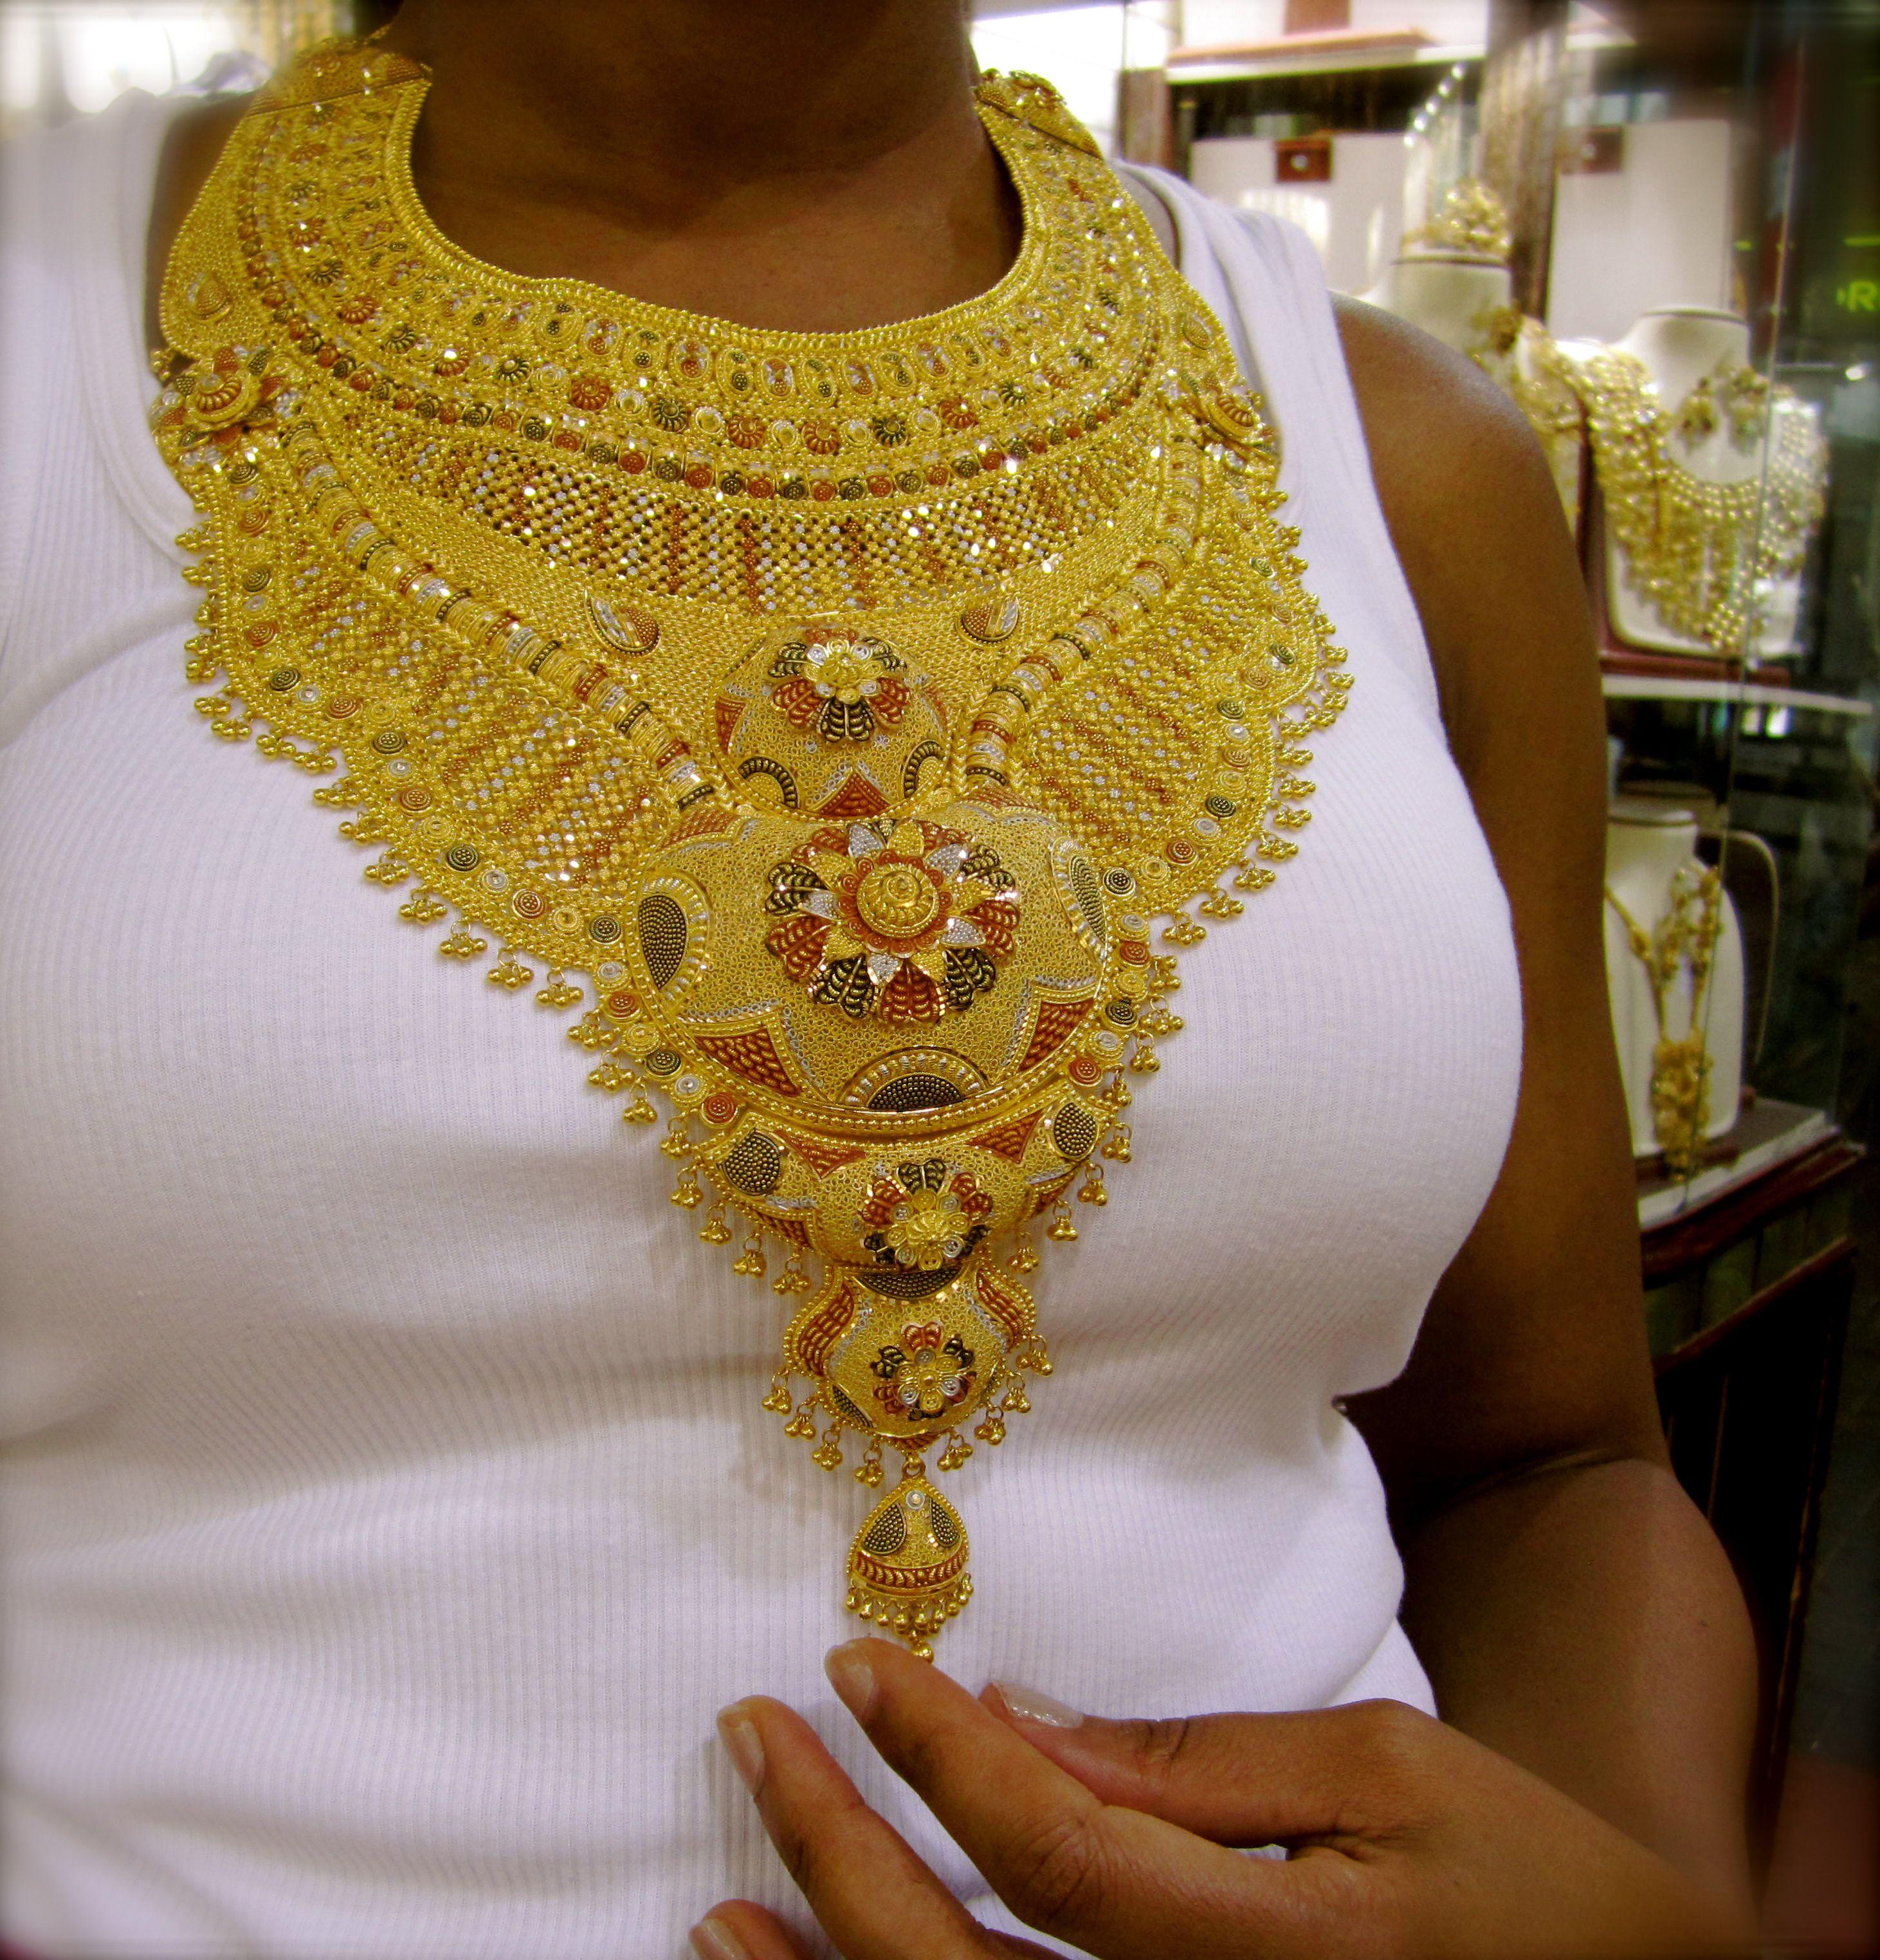 Dubai gold souk online shopping Google Search Dubai Jewellery